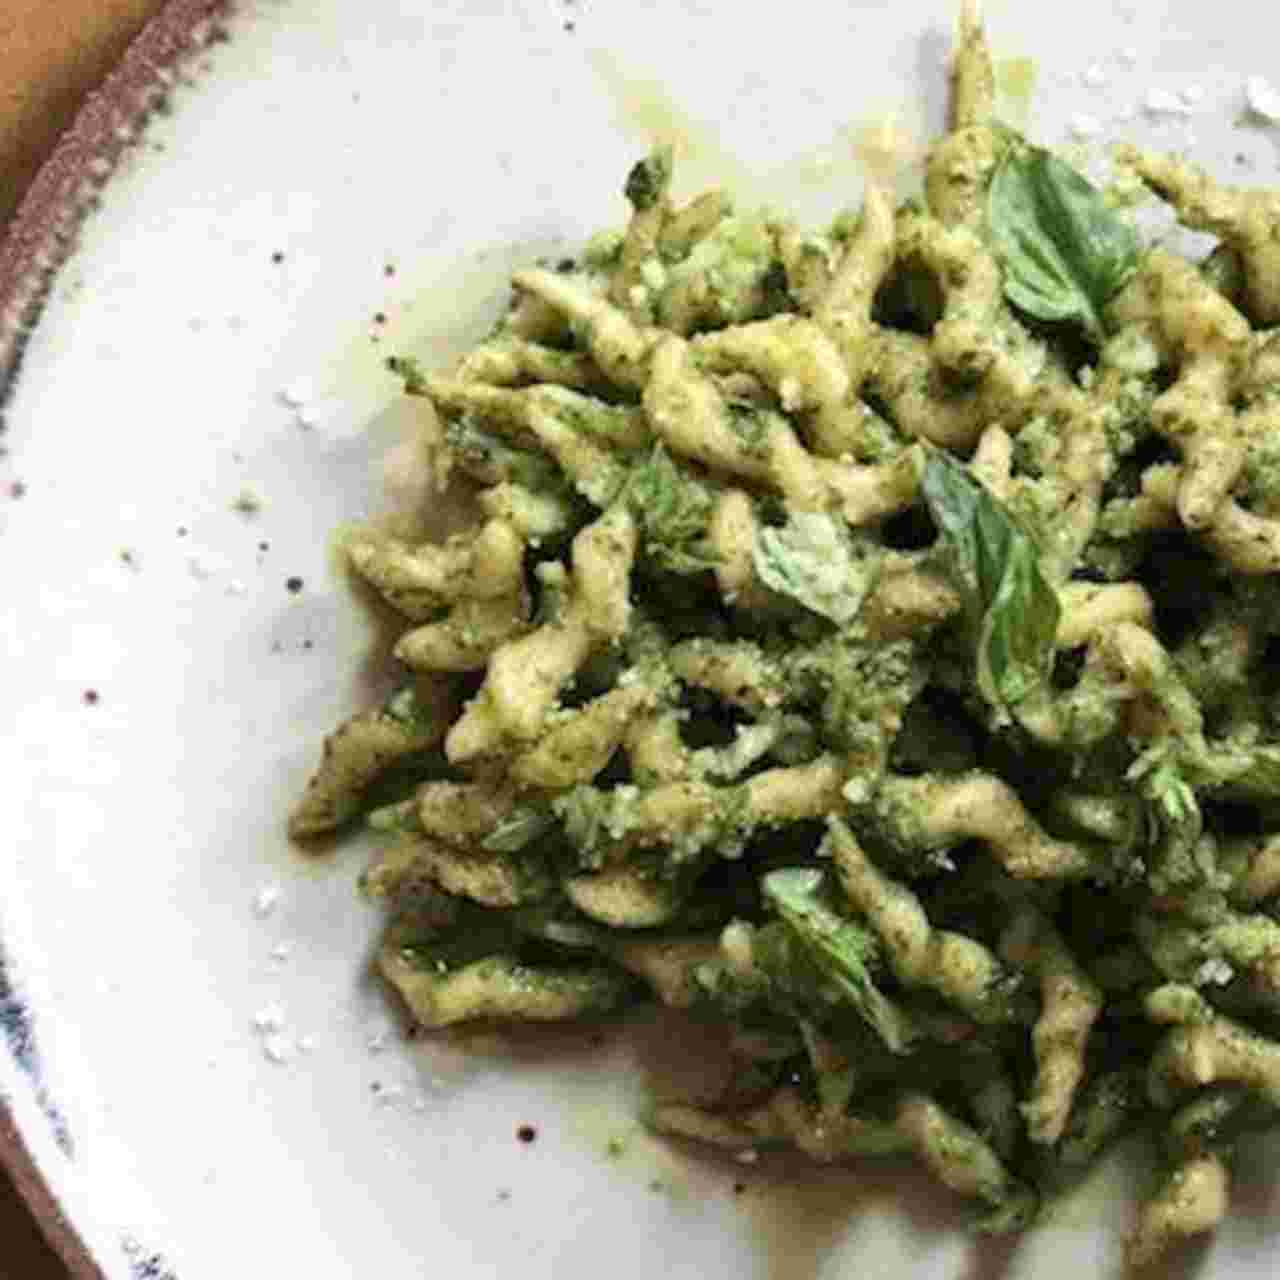 Best Italian Restaurants in LA